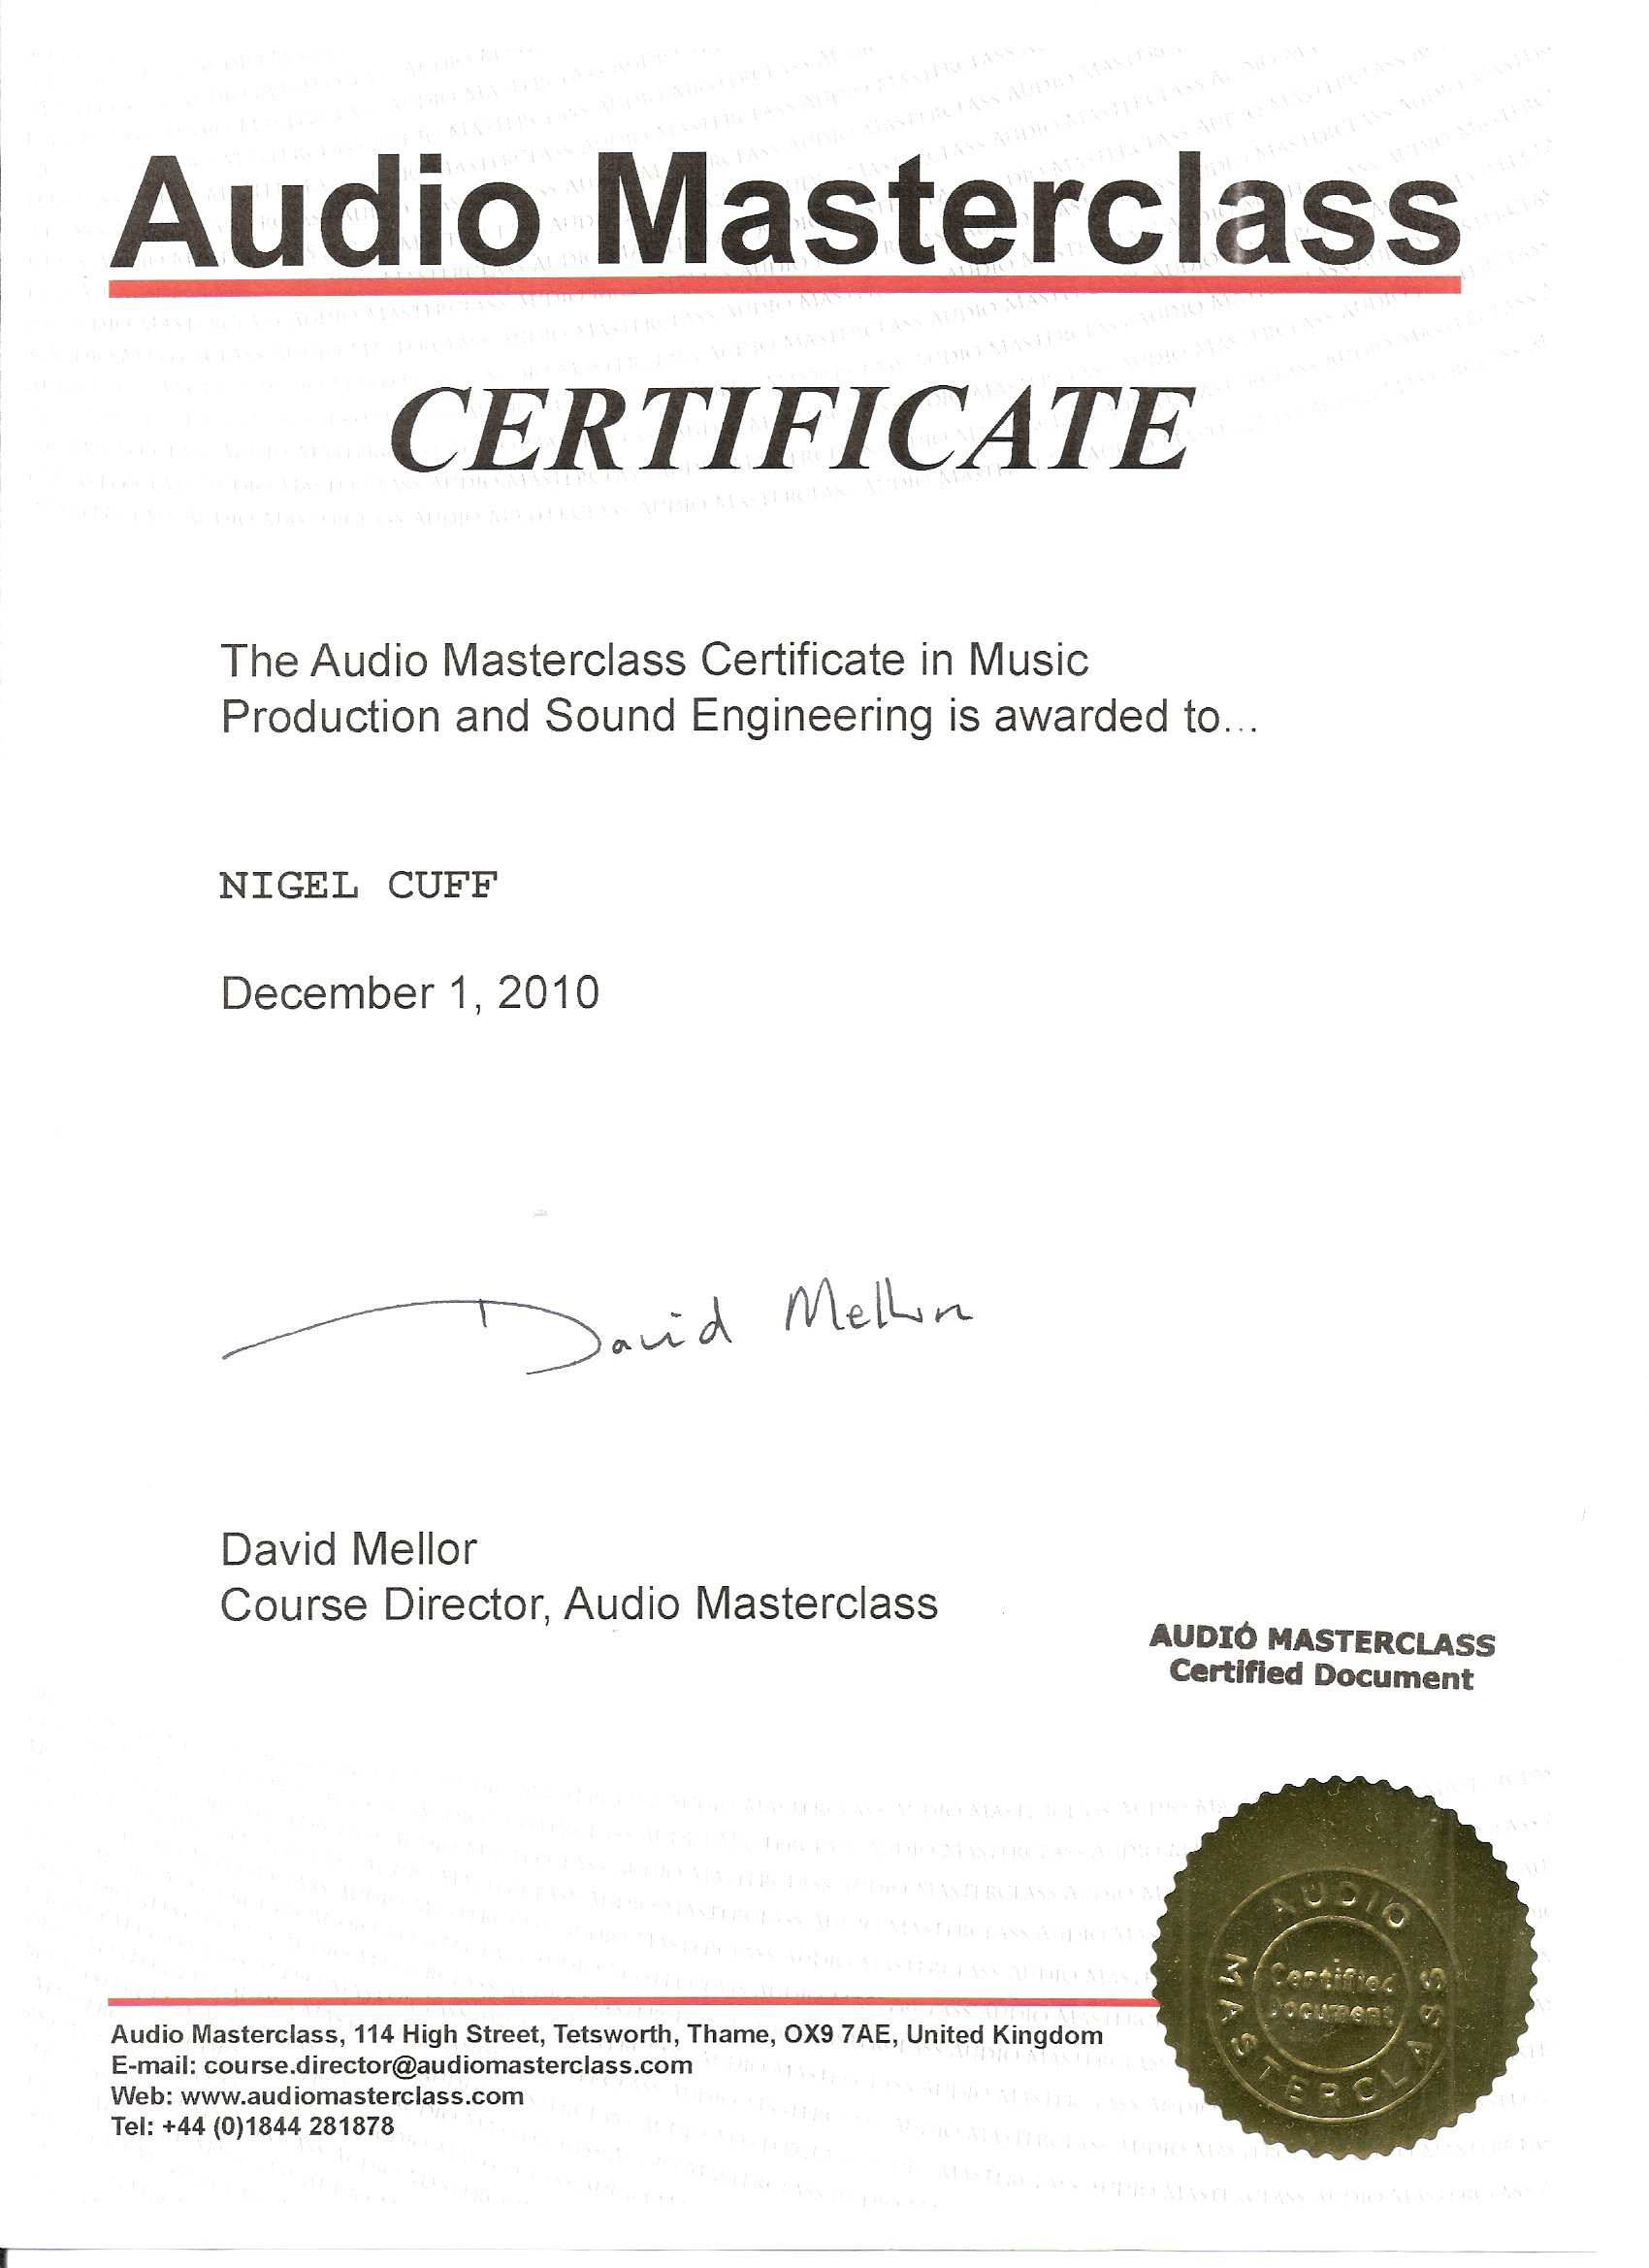 Nigel Cuff Demo Recording Services Songwriter Demo Service